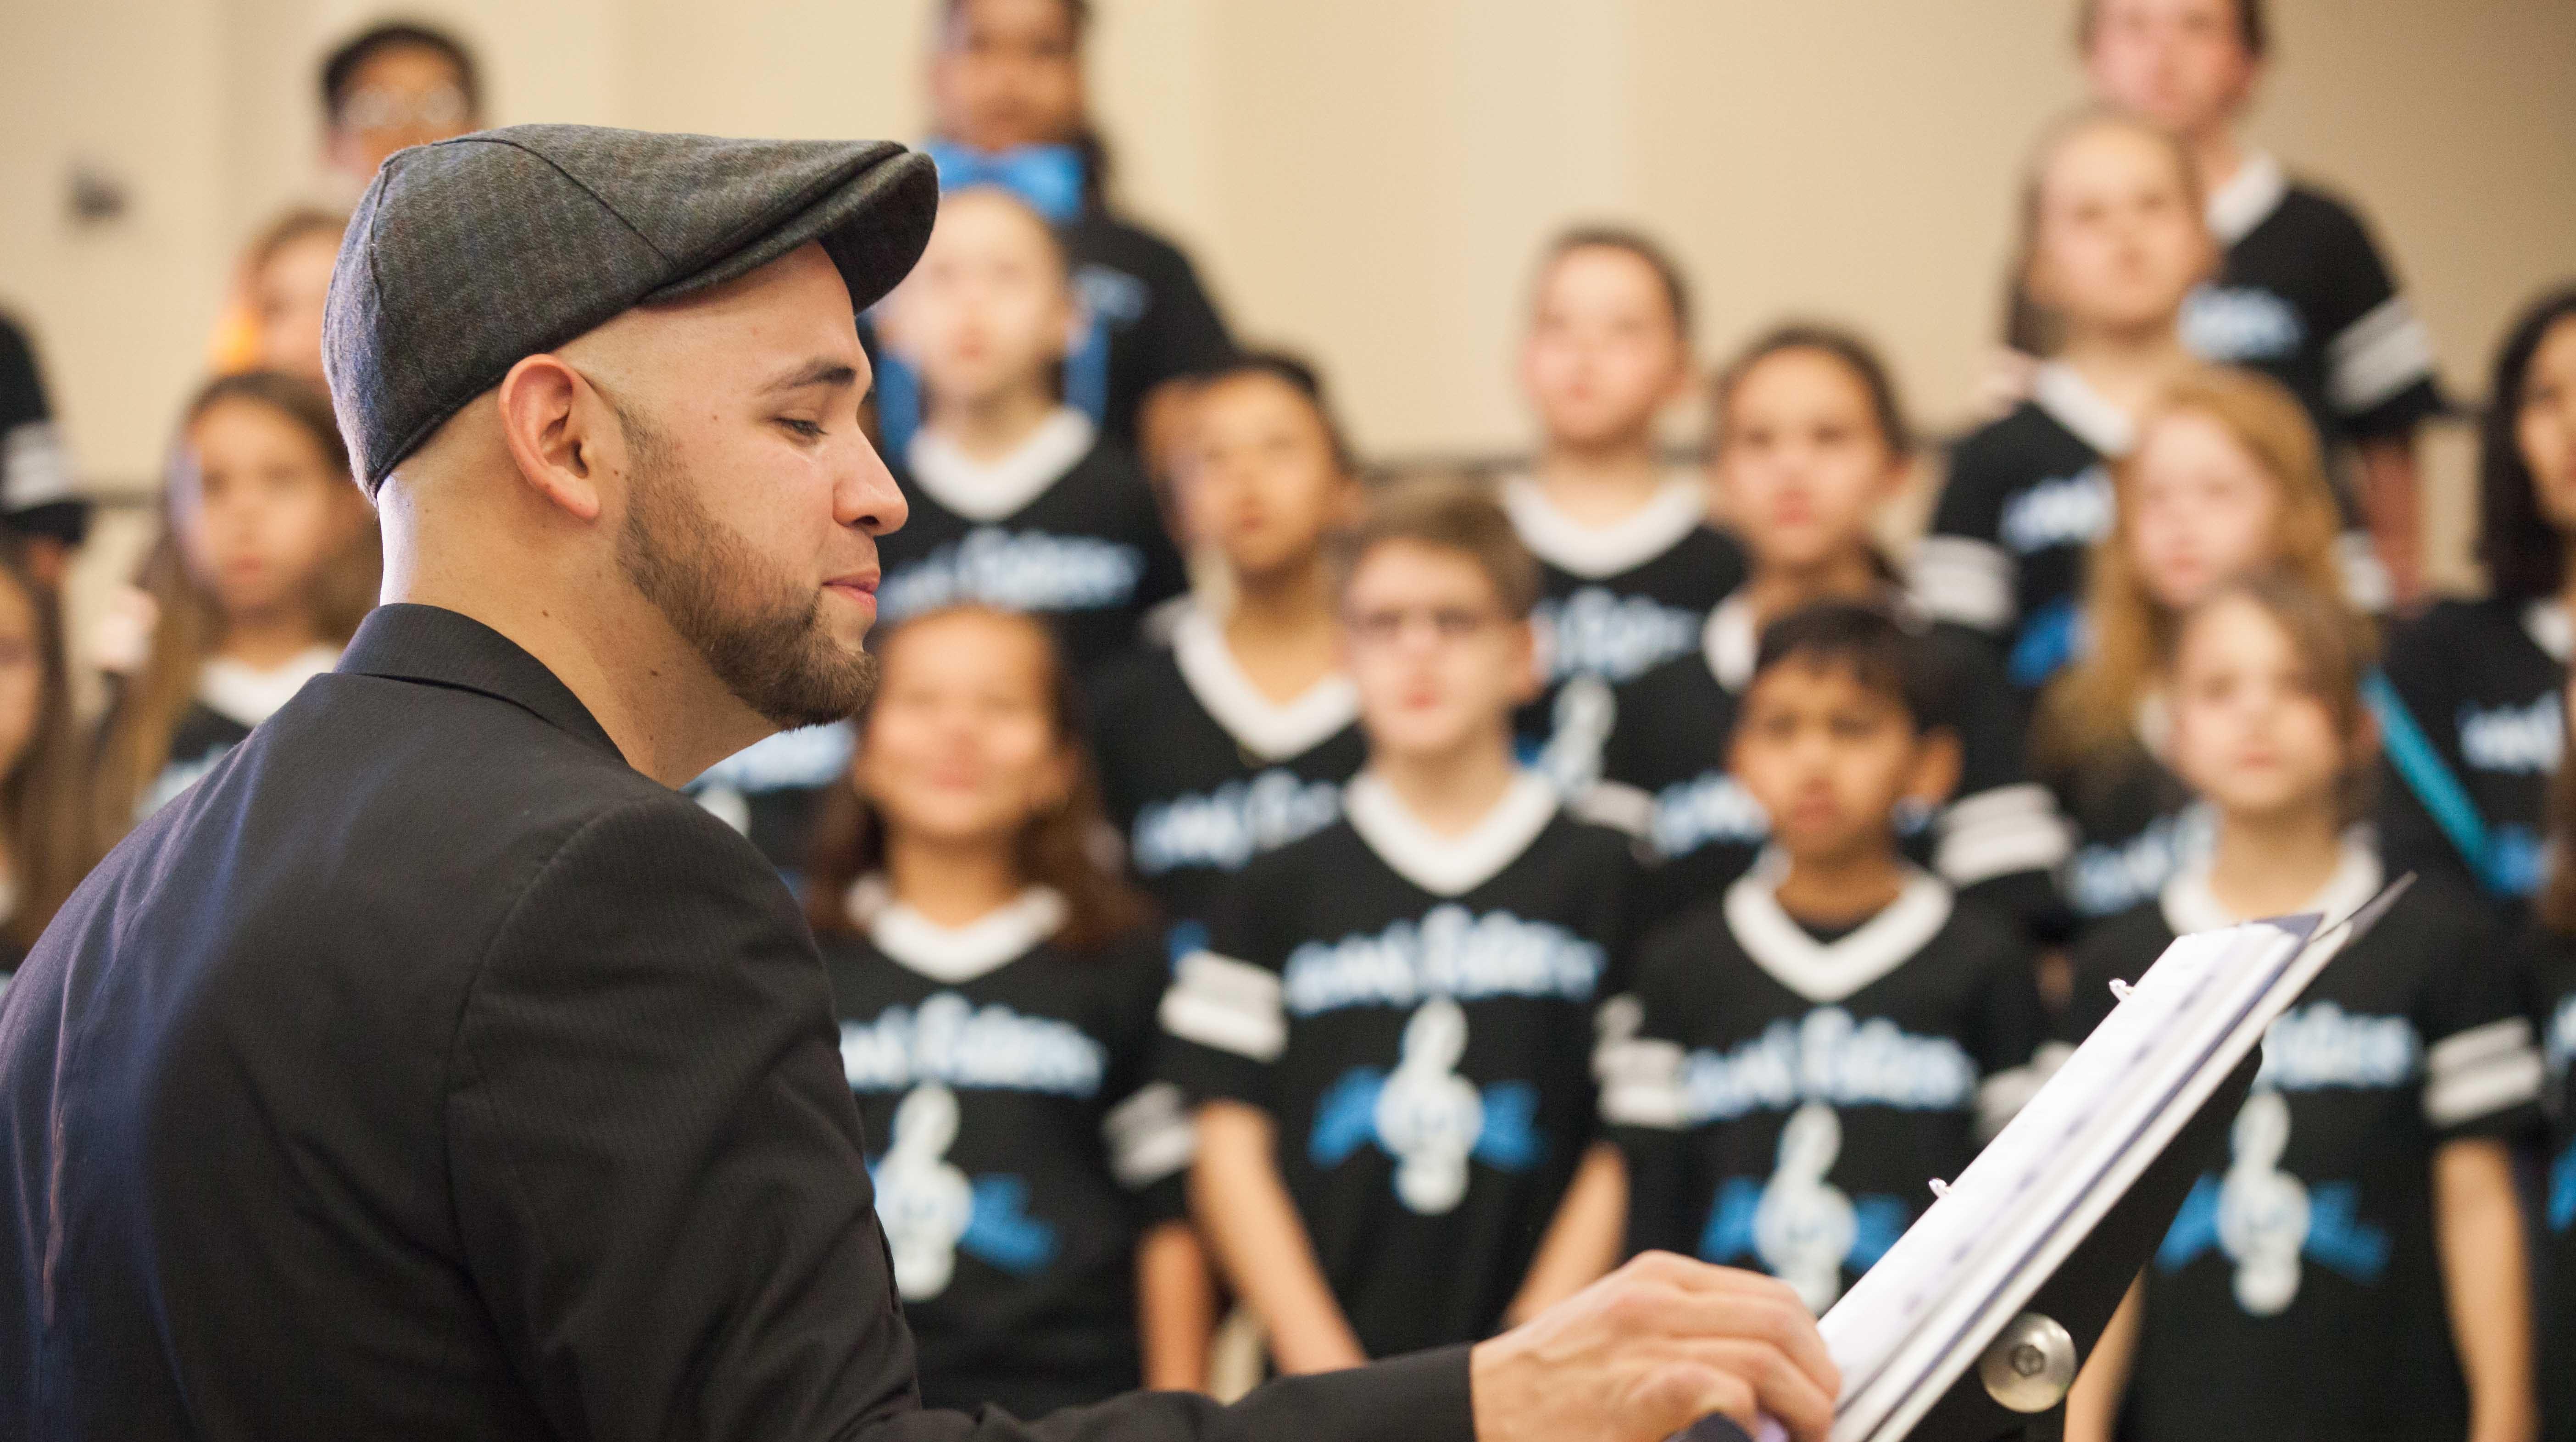 Corpus Christi native selected as semifinalist for 2019 Music Educator Award